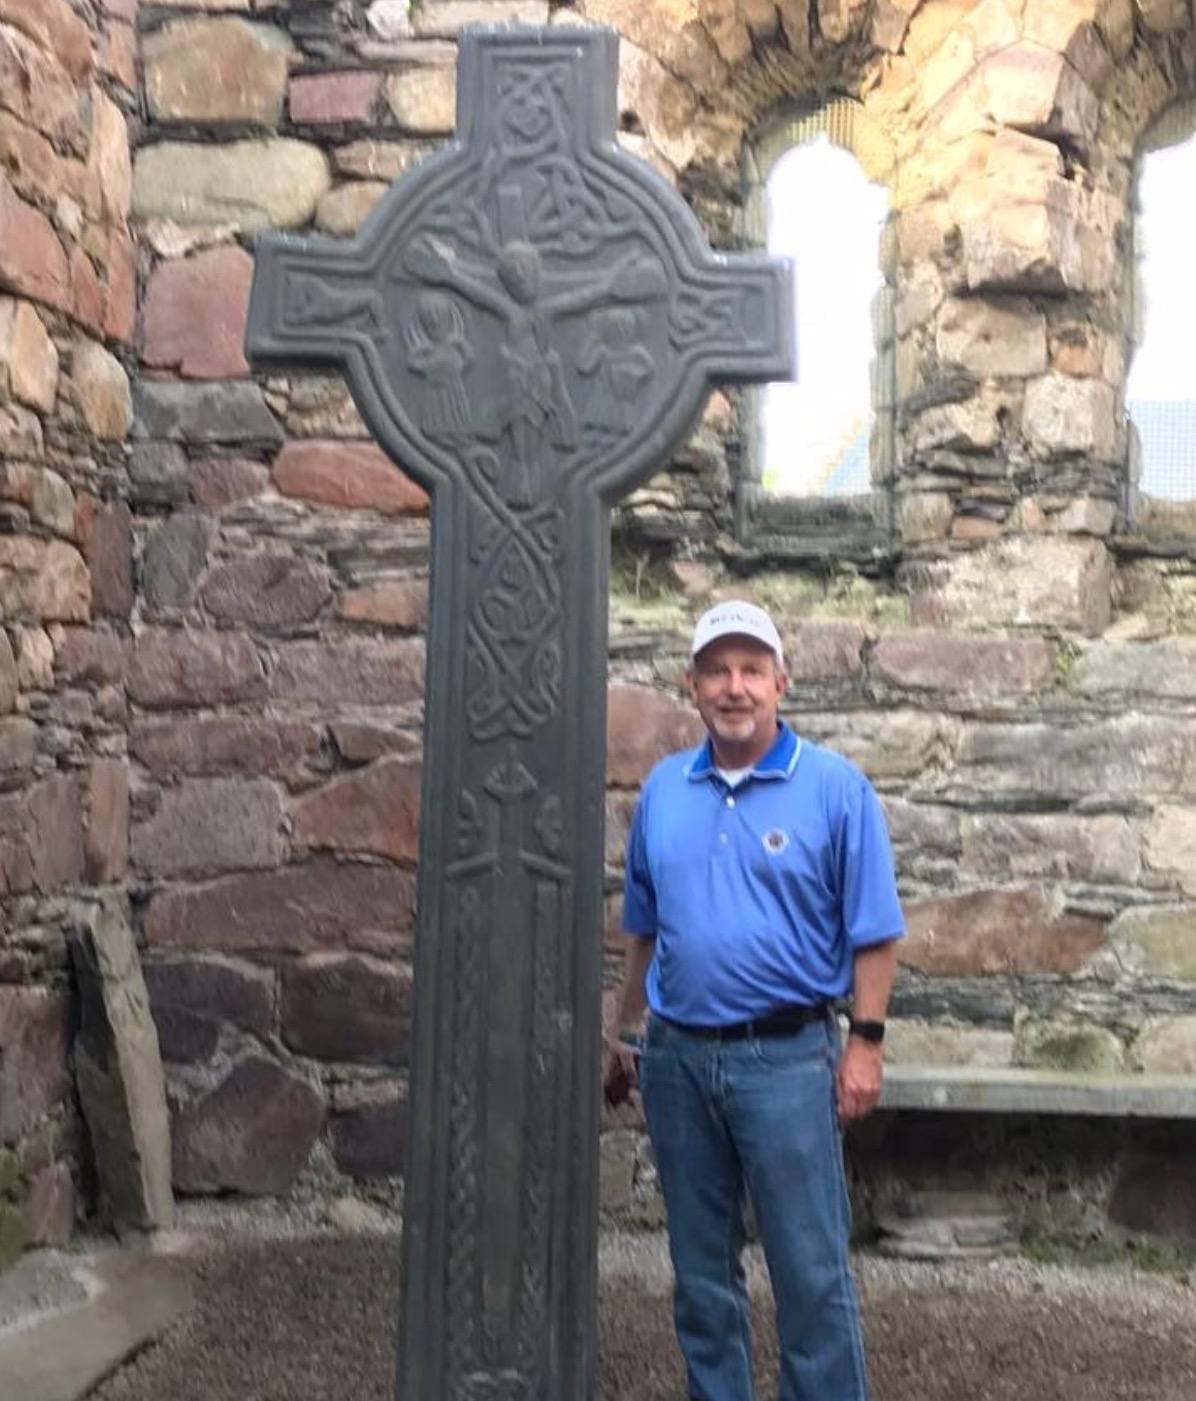 Rotary Club of St. Andrews International Golf Tournament 2018 - Don McMillan